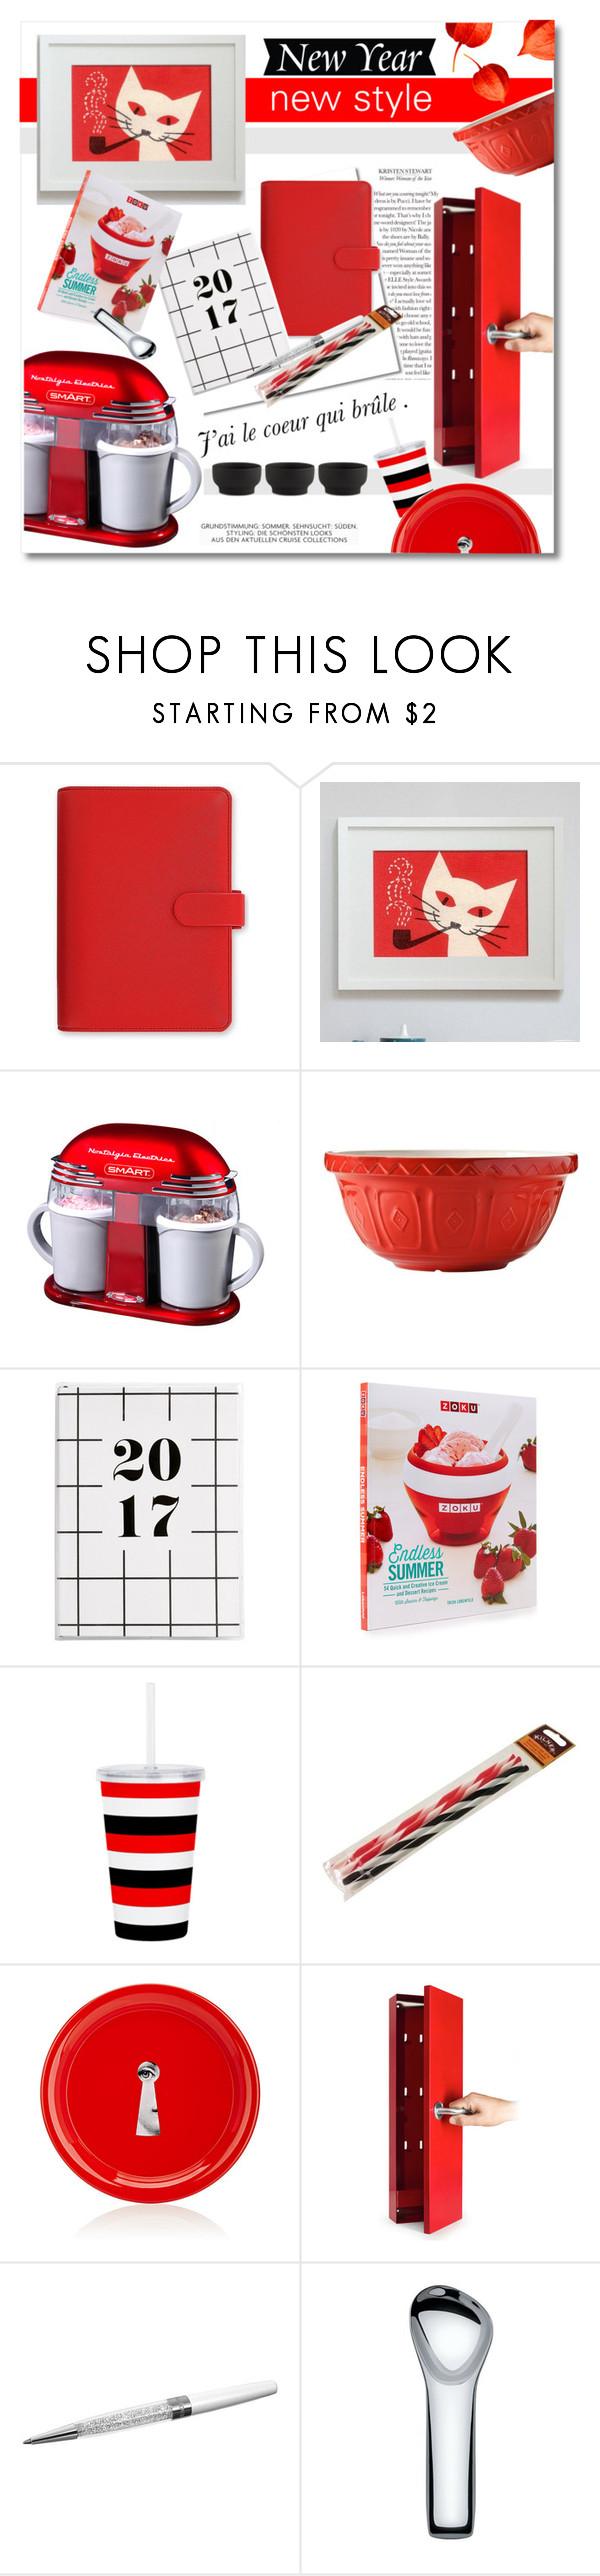 """New Year, new style"" by nucasa ❤ liked on Polyvore featuring interior, interiors, interior design, home, home decor, interior decorating, FiloFax, Mason Cash, Kilner and Fornasetti"